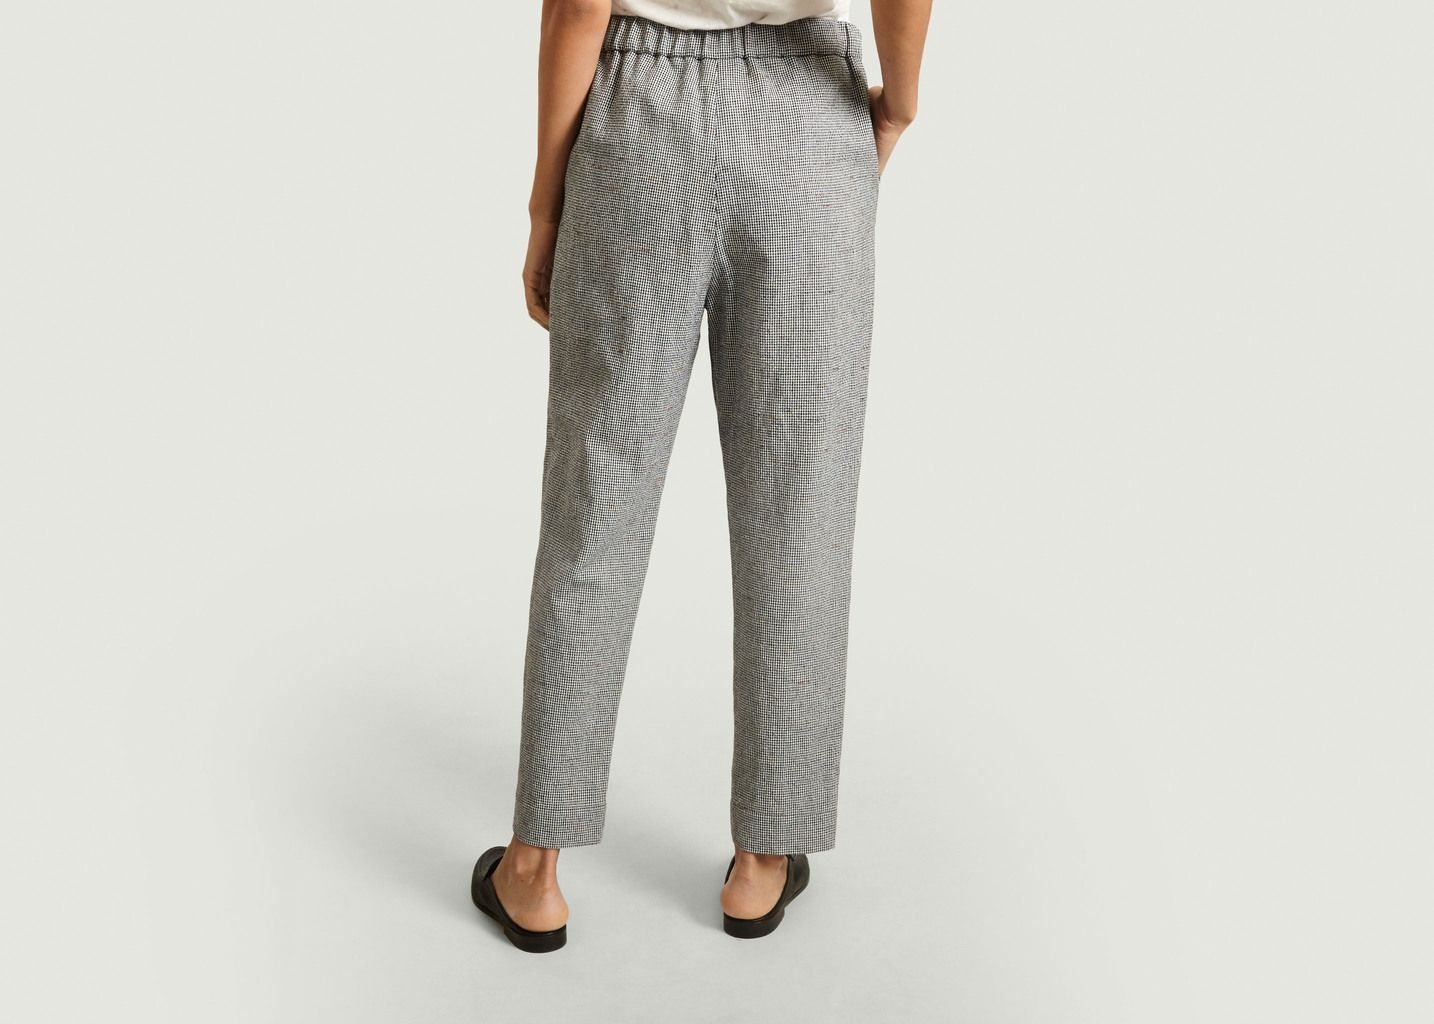 Pantalon motif pied-de-poule Othilia - By Malene Birger